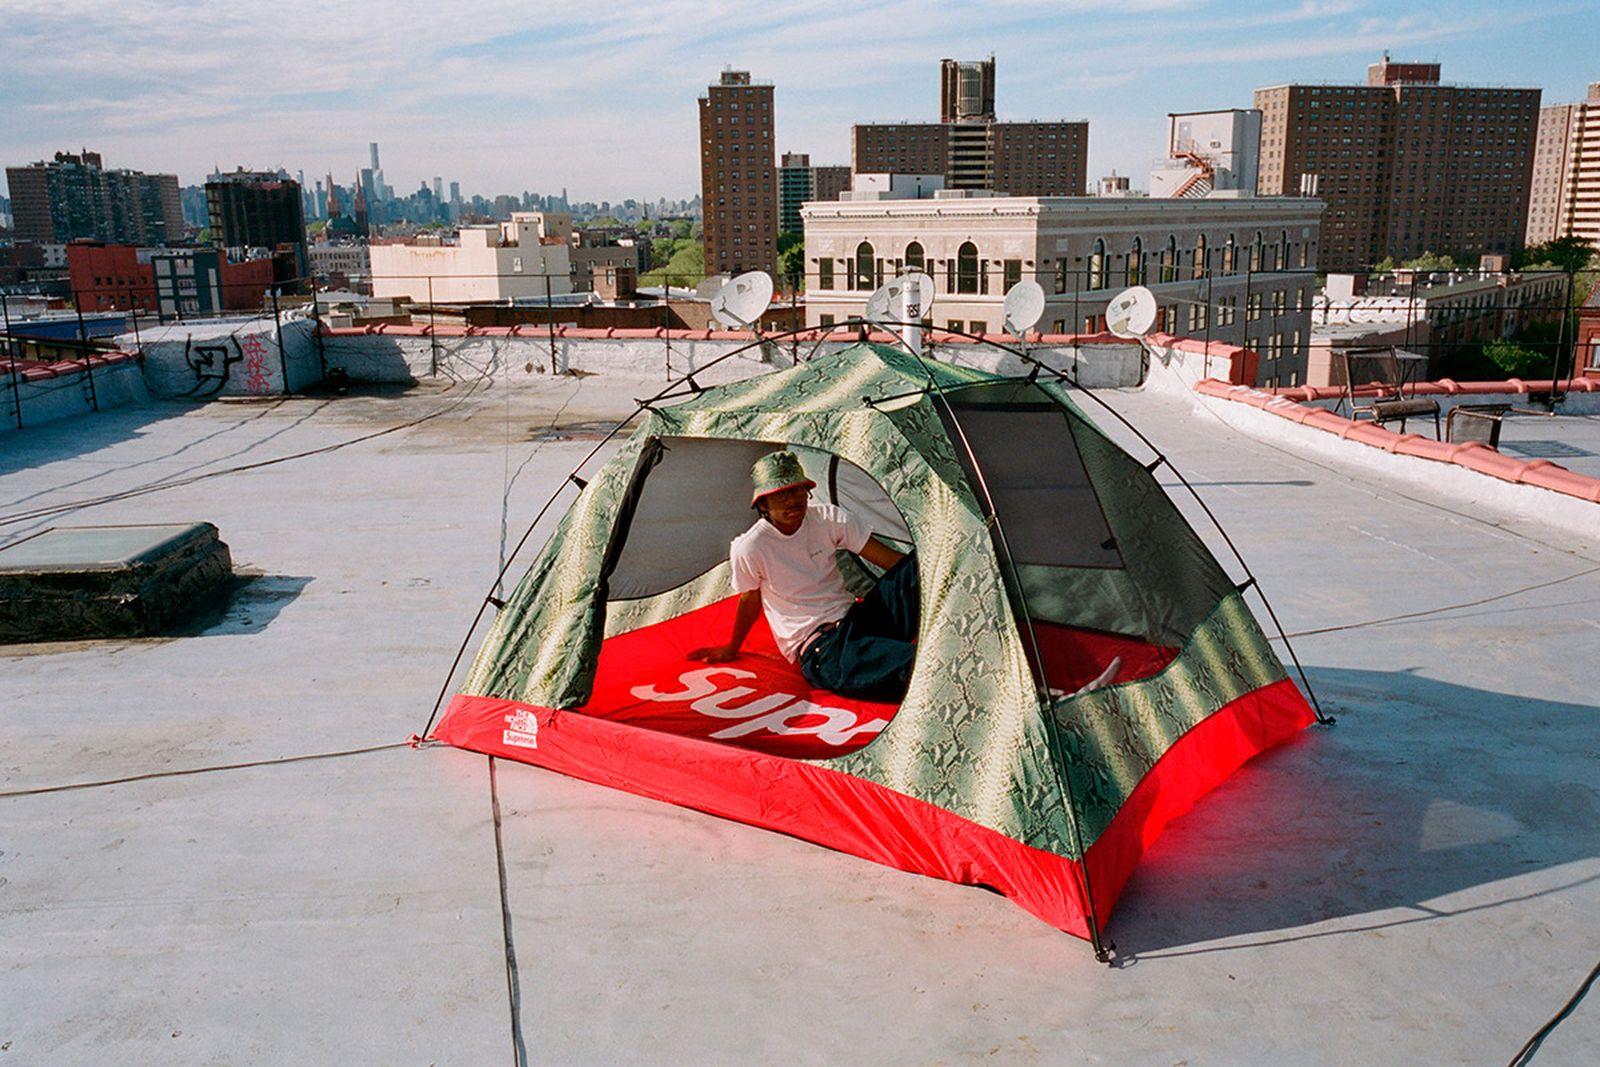 supreme the north face tent main OFF-WHITE c/o Virgil Abloh Ralph Lauren hugo boss